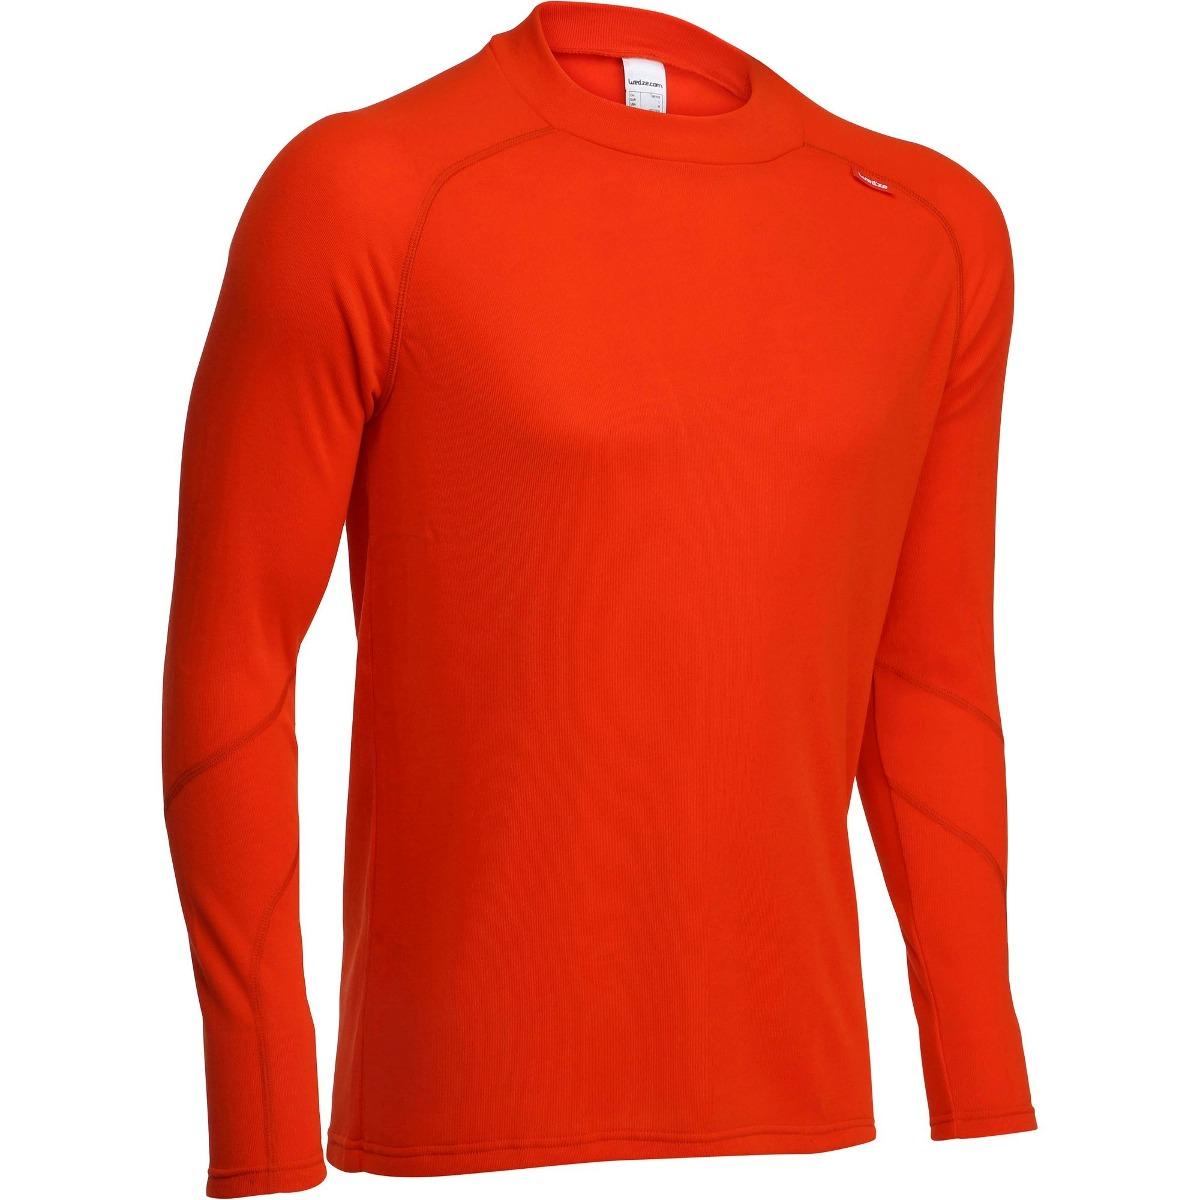 105c9743d1fb1 blusa frio masculina segunda pele isolamento térmico laranja. Carregando  zoom.